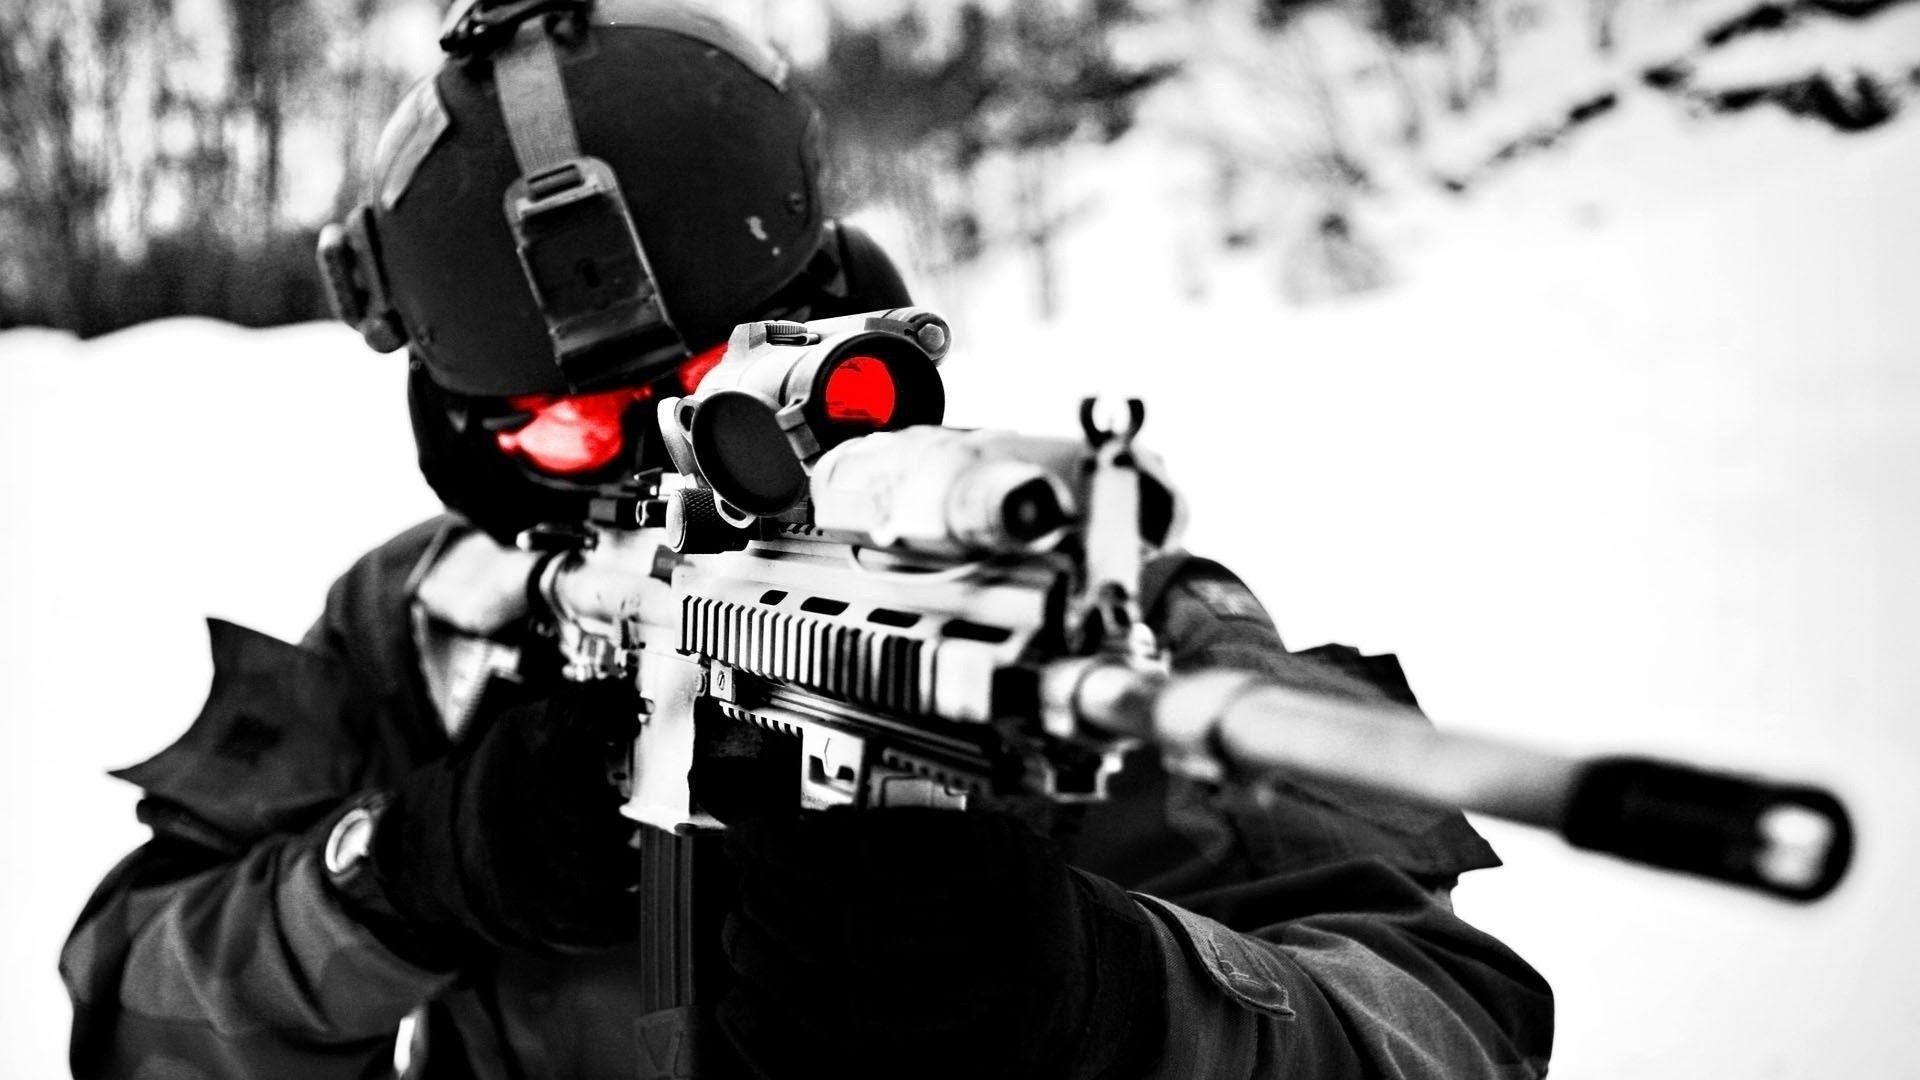 Navy Seal Sniper Wallpaper (65+ images)